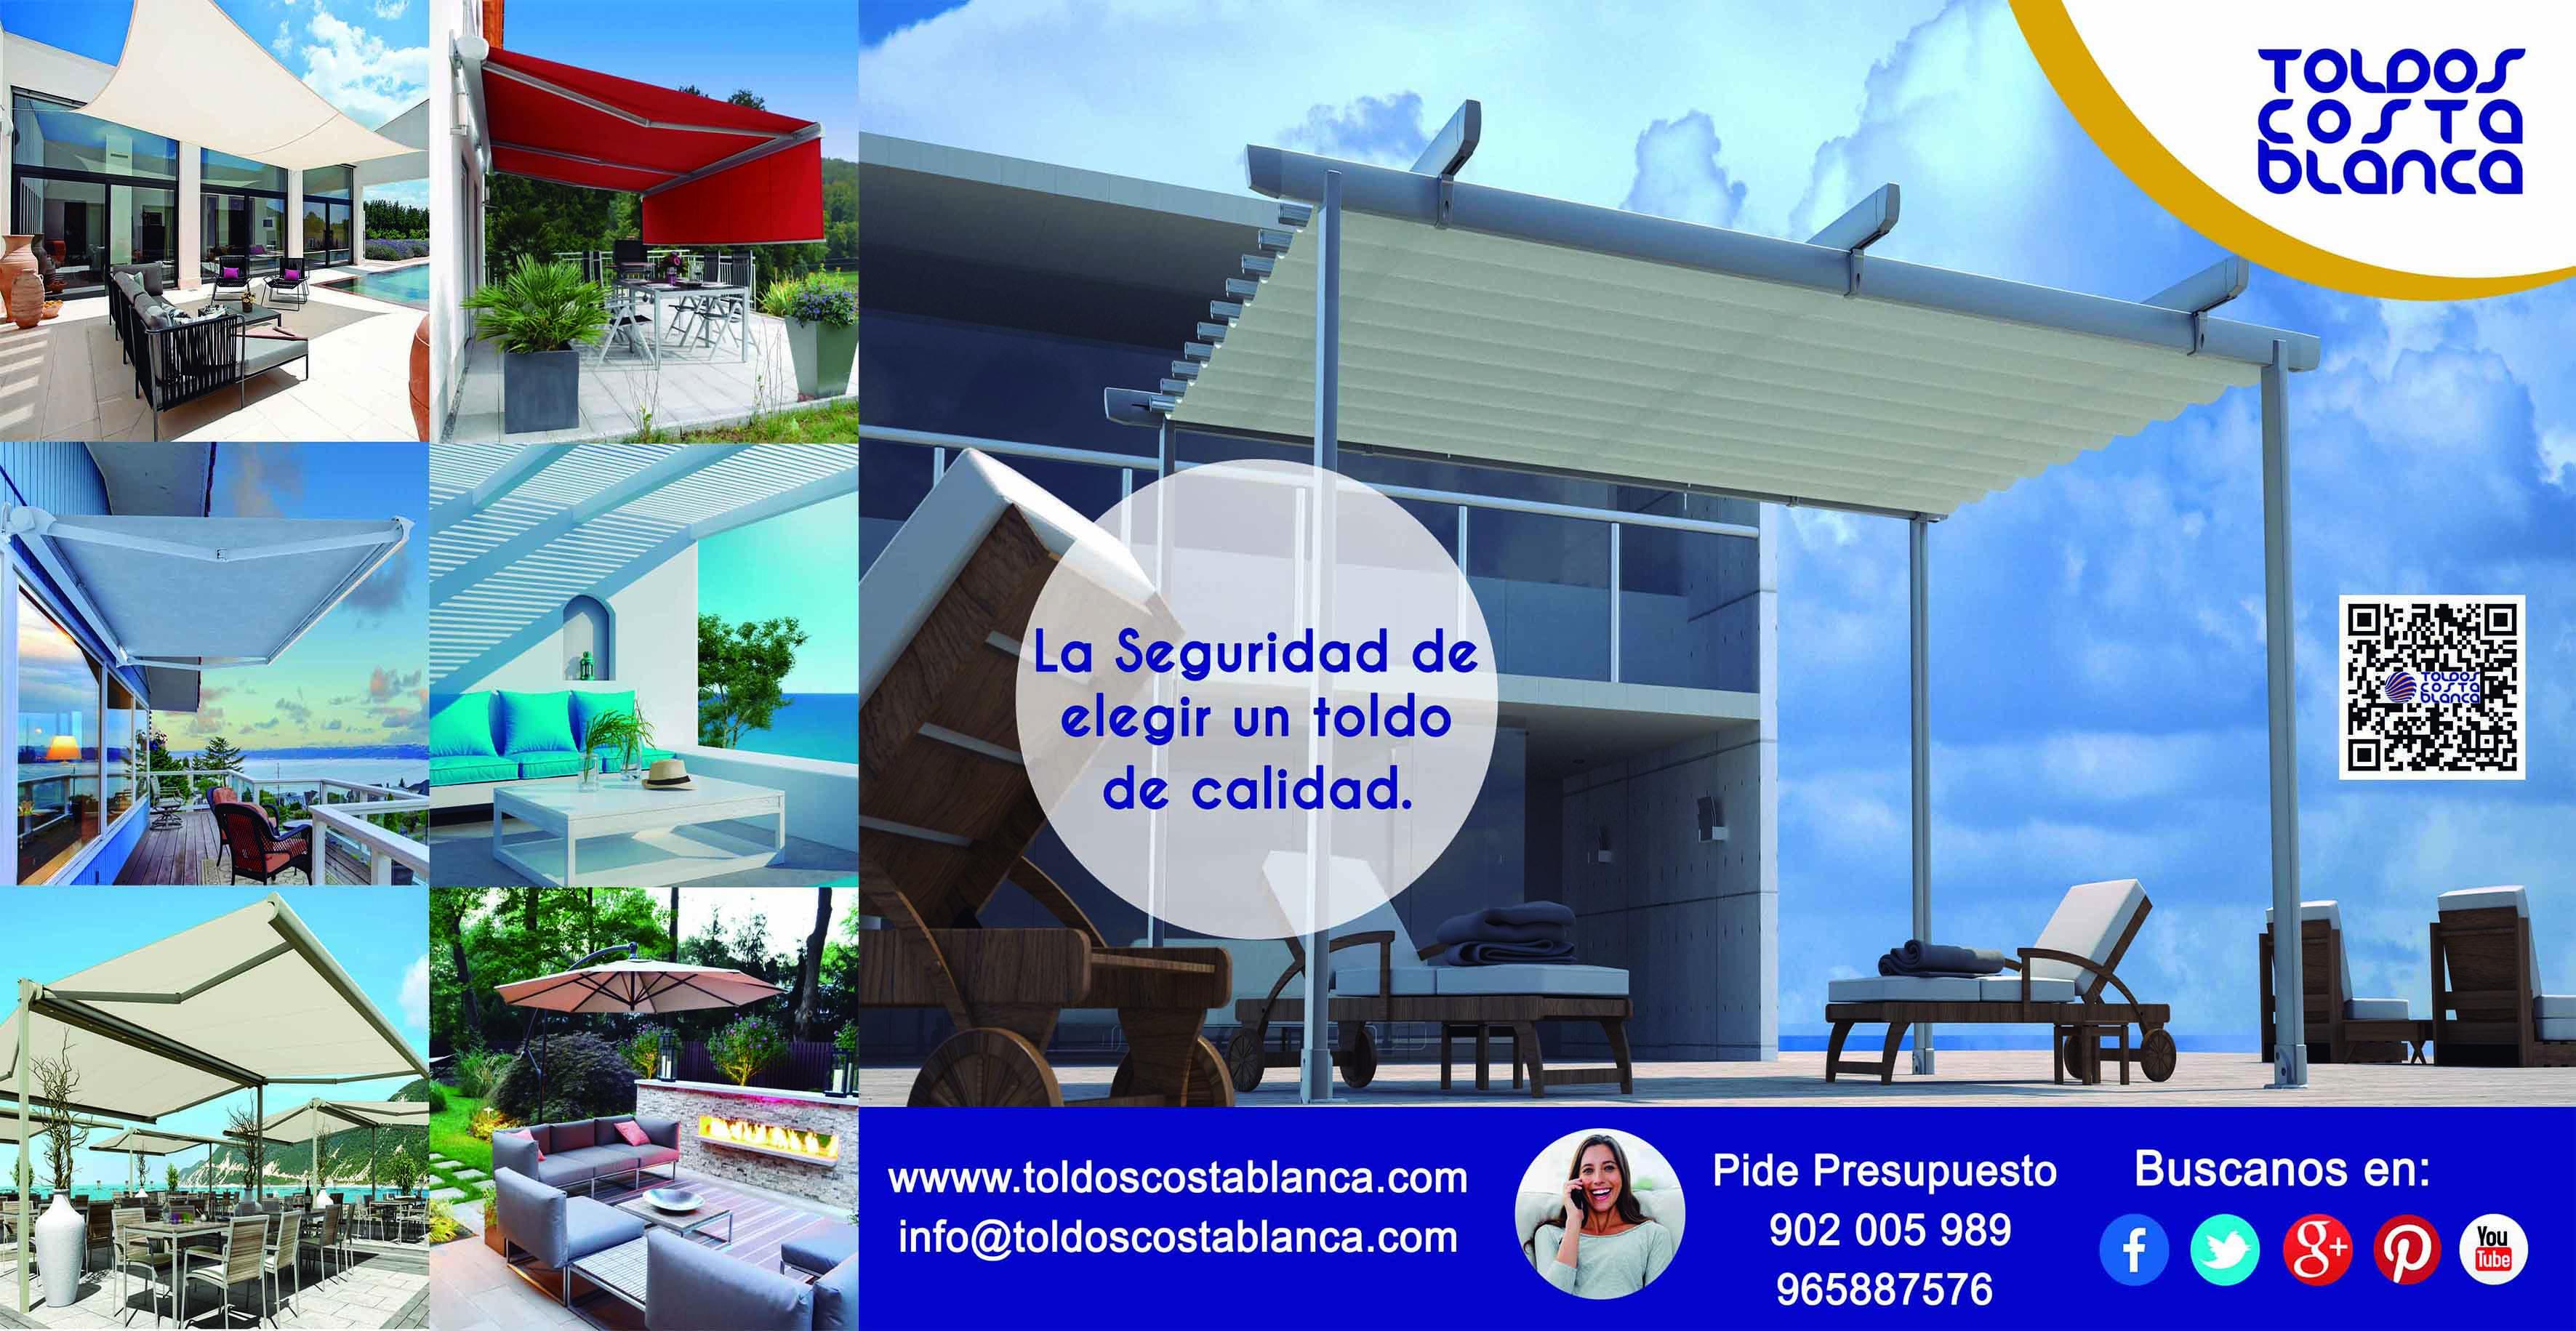 Diseño de valla publicitaria de Toldos Coata Blanca.